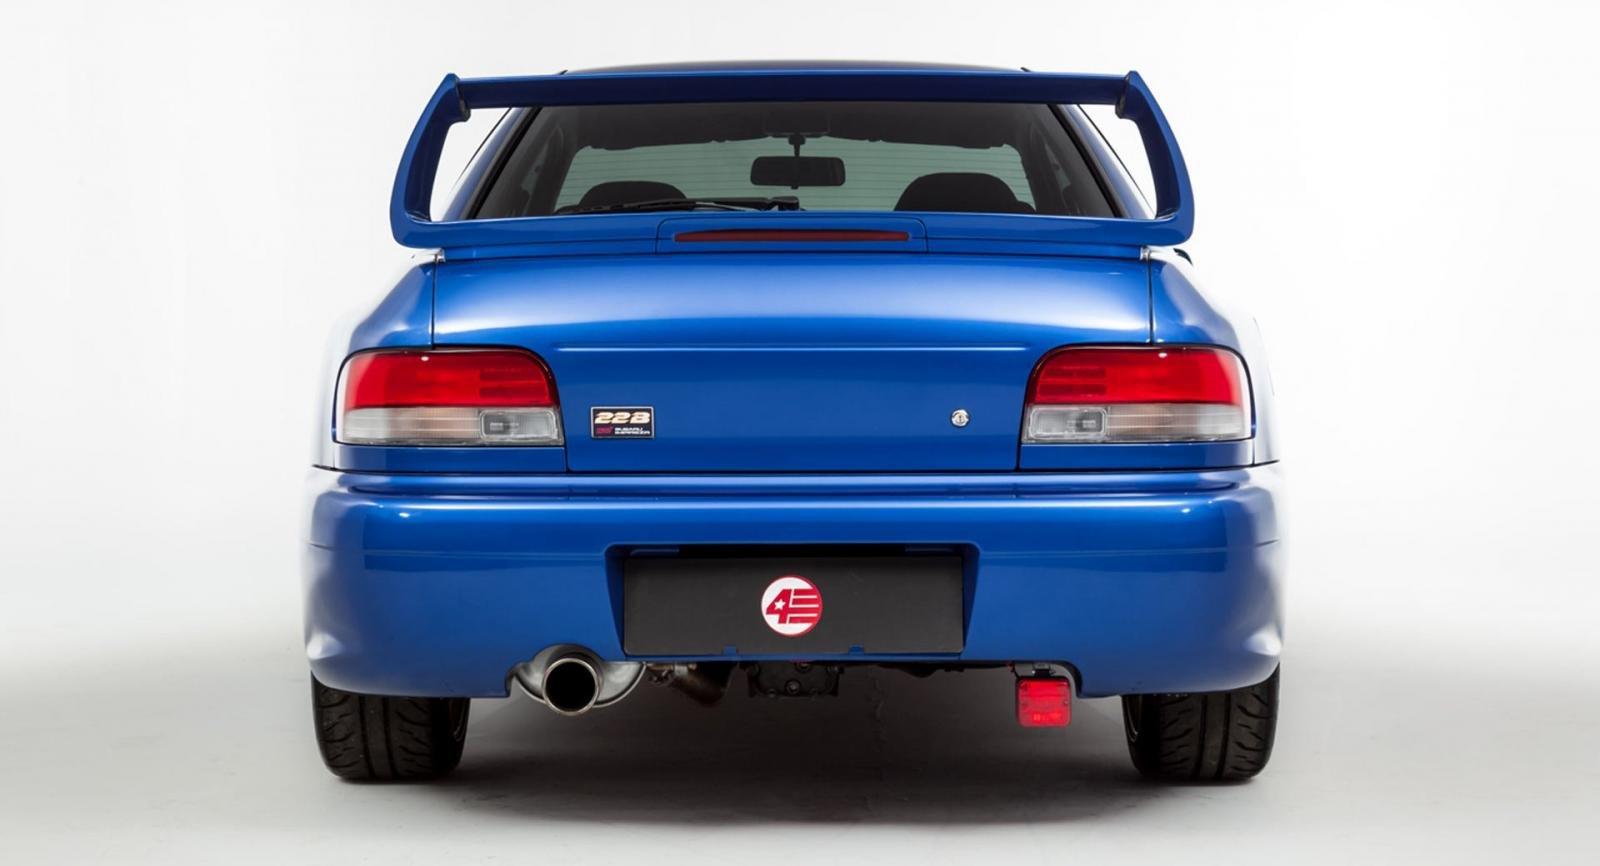 Ngoại hình Subaru Impreza 22B STi.